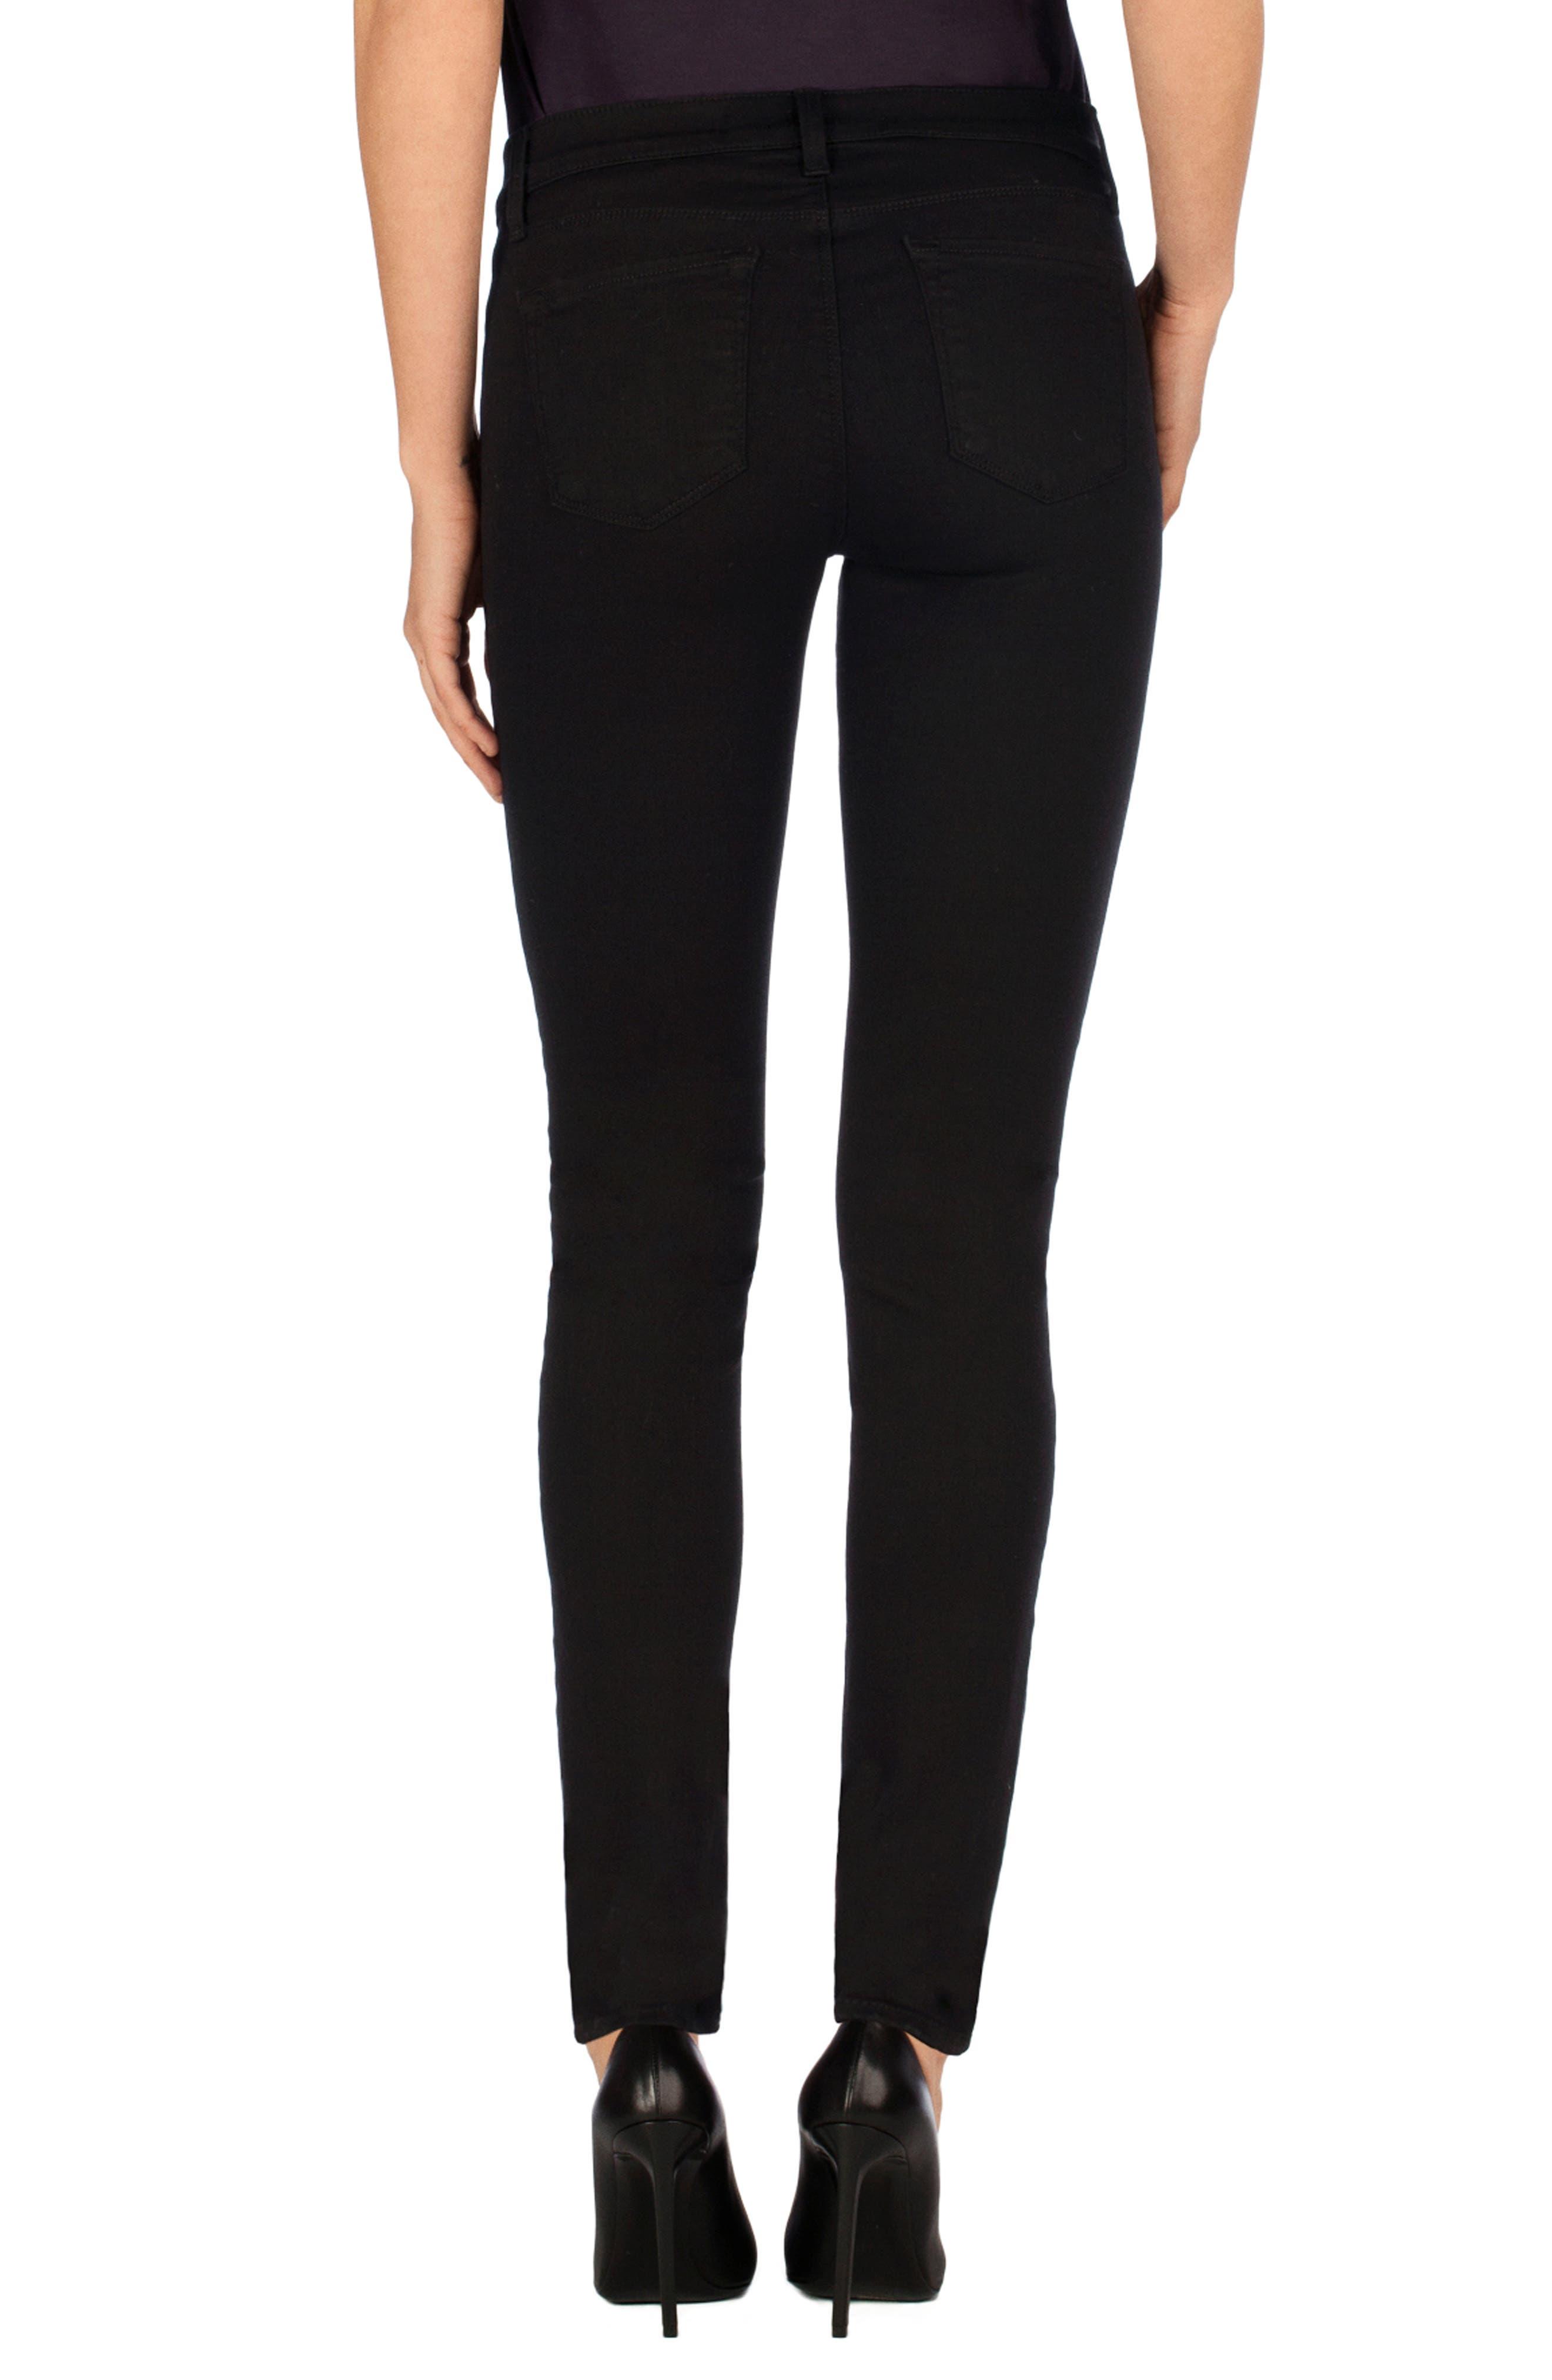 J BRAND,                             Super Skinny Jeans,                             Alternate thumbnail 2, color,                             SERIOUSLY BLACK